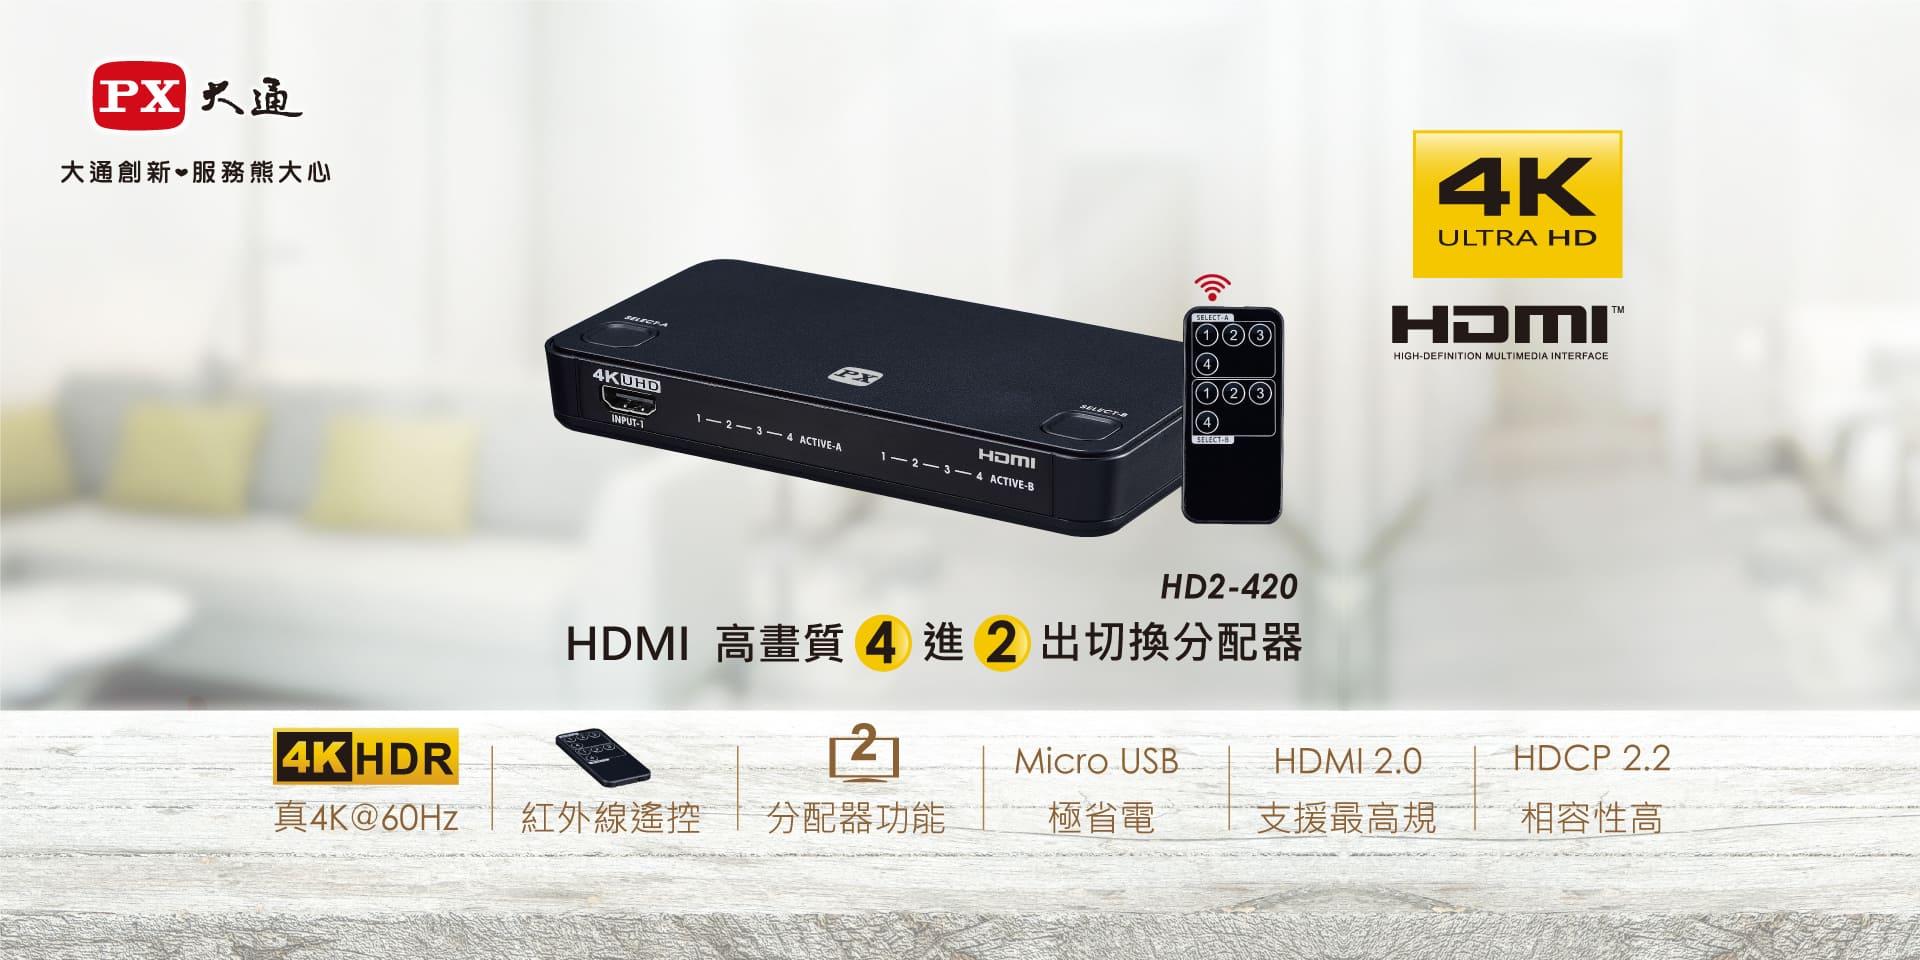 proimages/product/HDMI/HD2-420/HD2-420_01.jpg